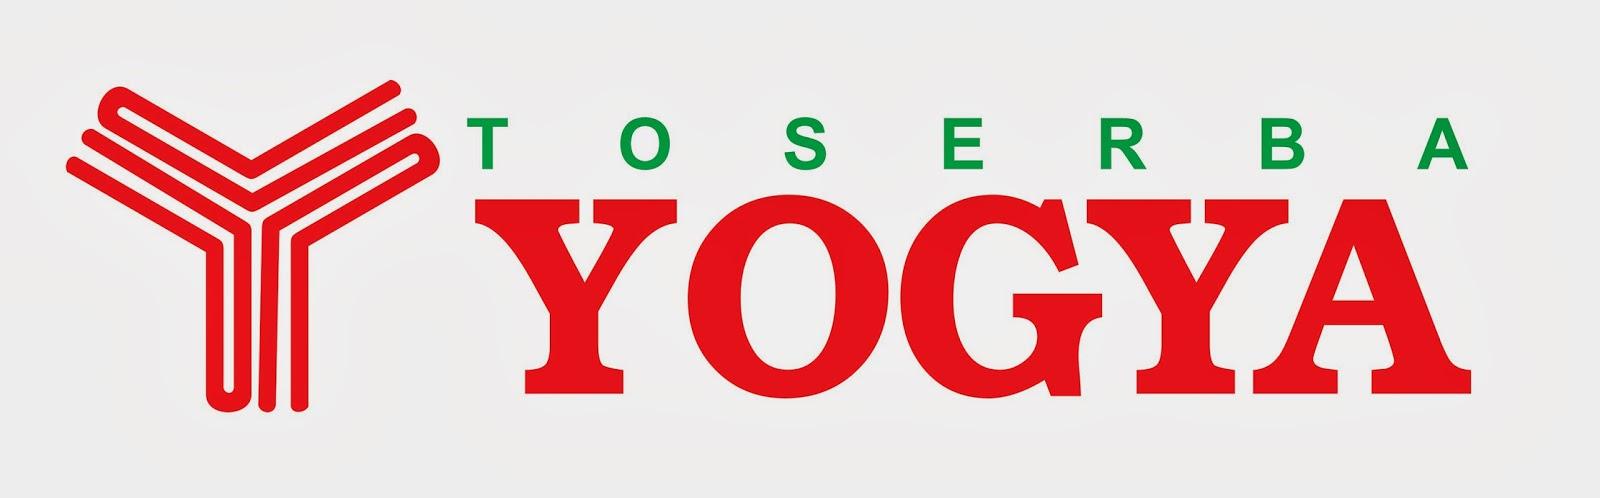 Katalog Toserba Yogya